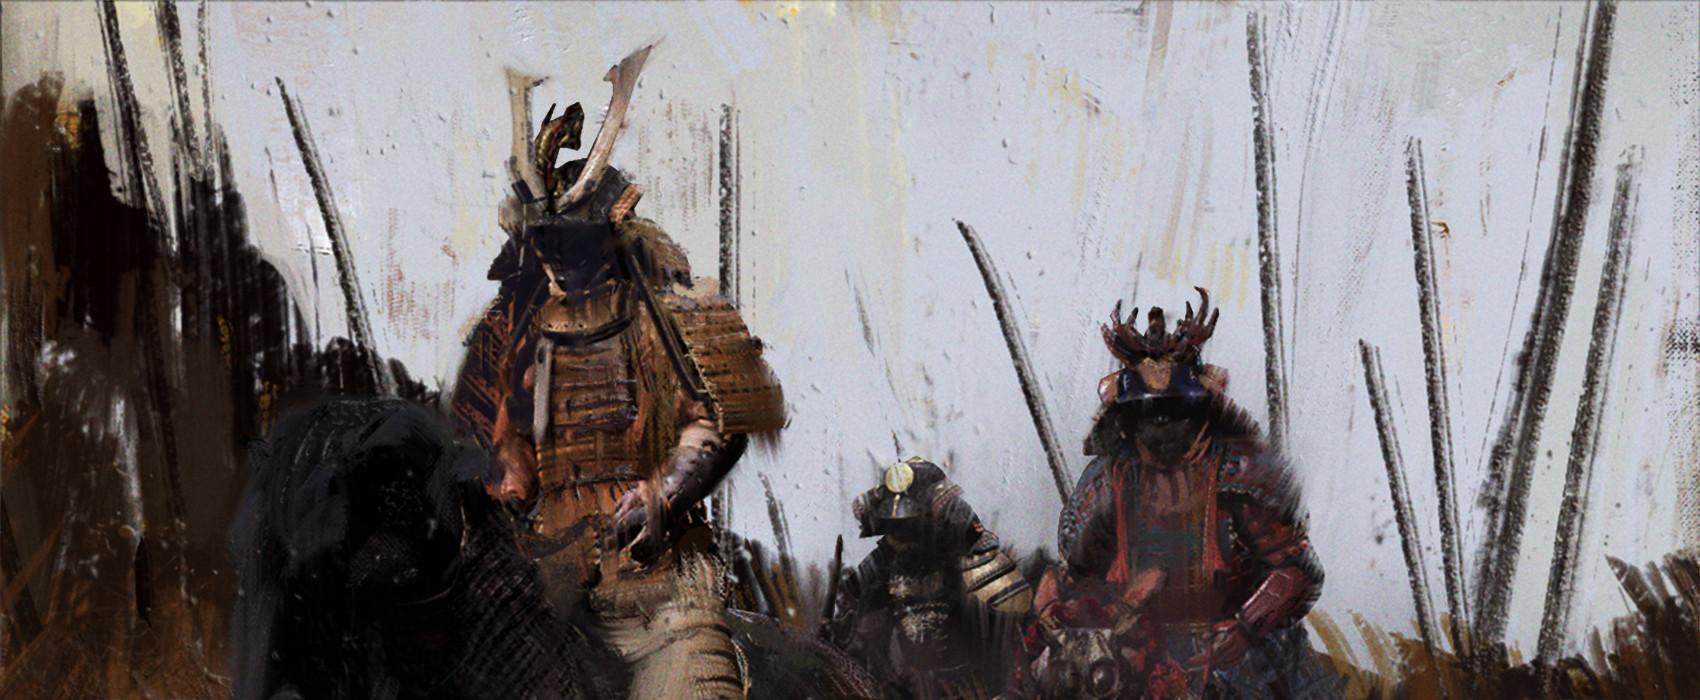 David tilton samuraipainting1 v1